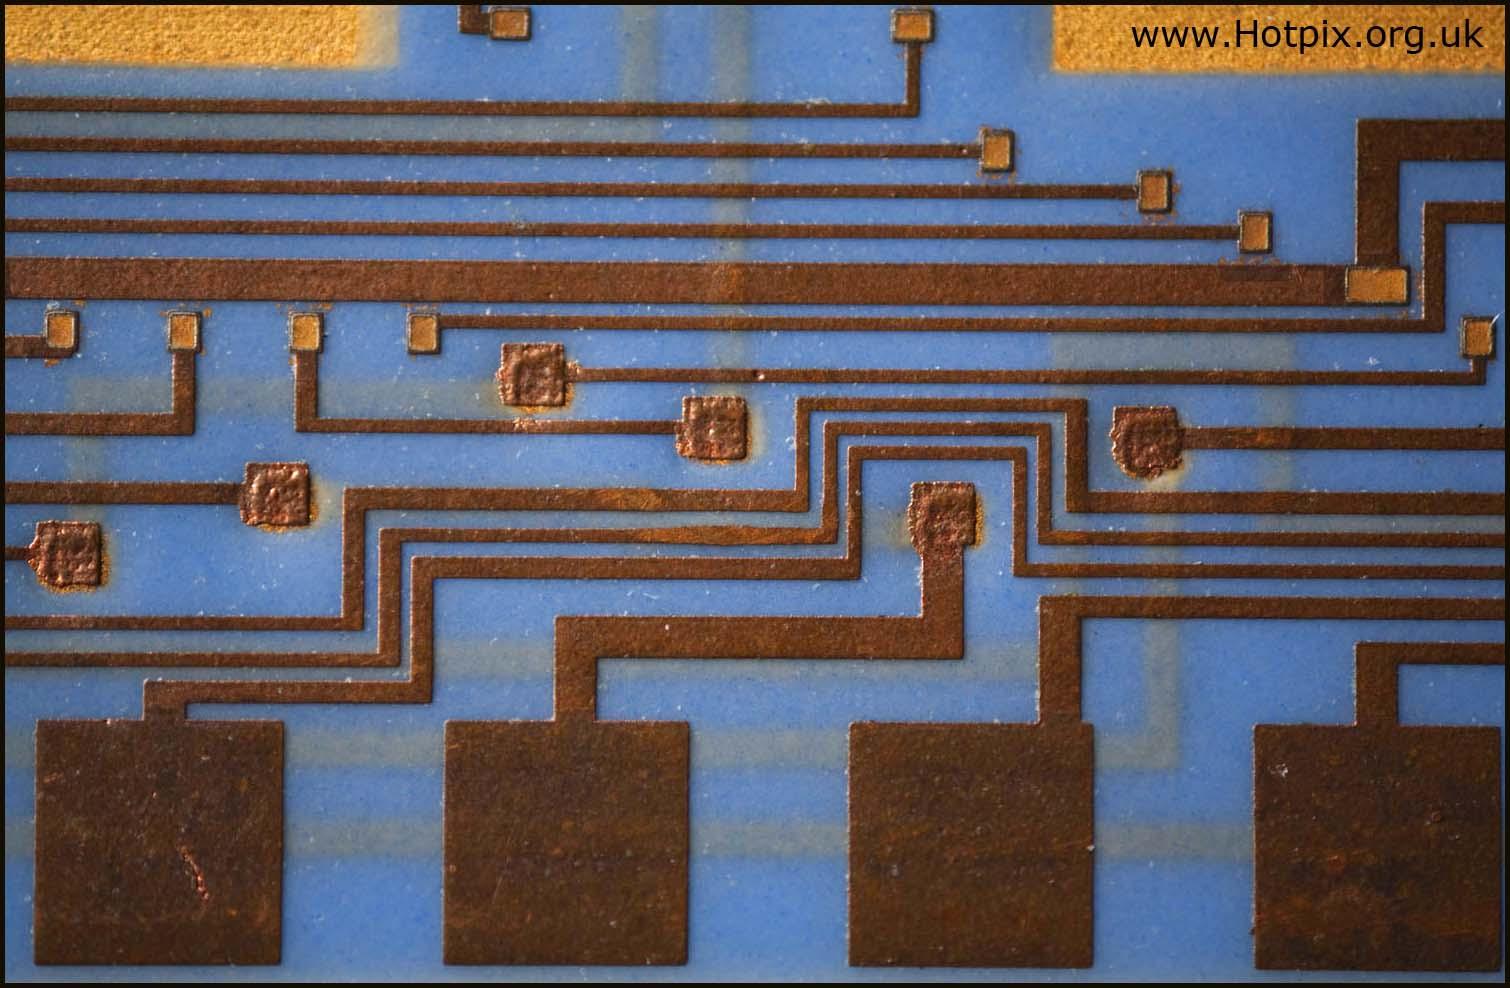 circuit,board,ceramic,military,extreme,macro,lens,bellows,tubes,copper,gold,ice,manor,park,1987,runcorn,cheshire,uk,england,stillife,stilllife,still,life,old,stuff,abstract,hotpix!